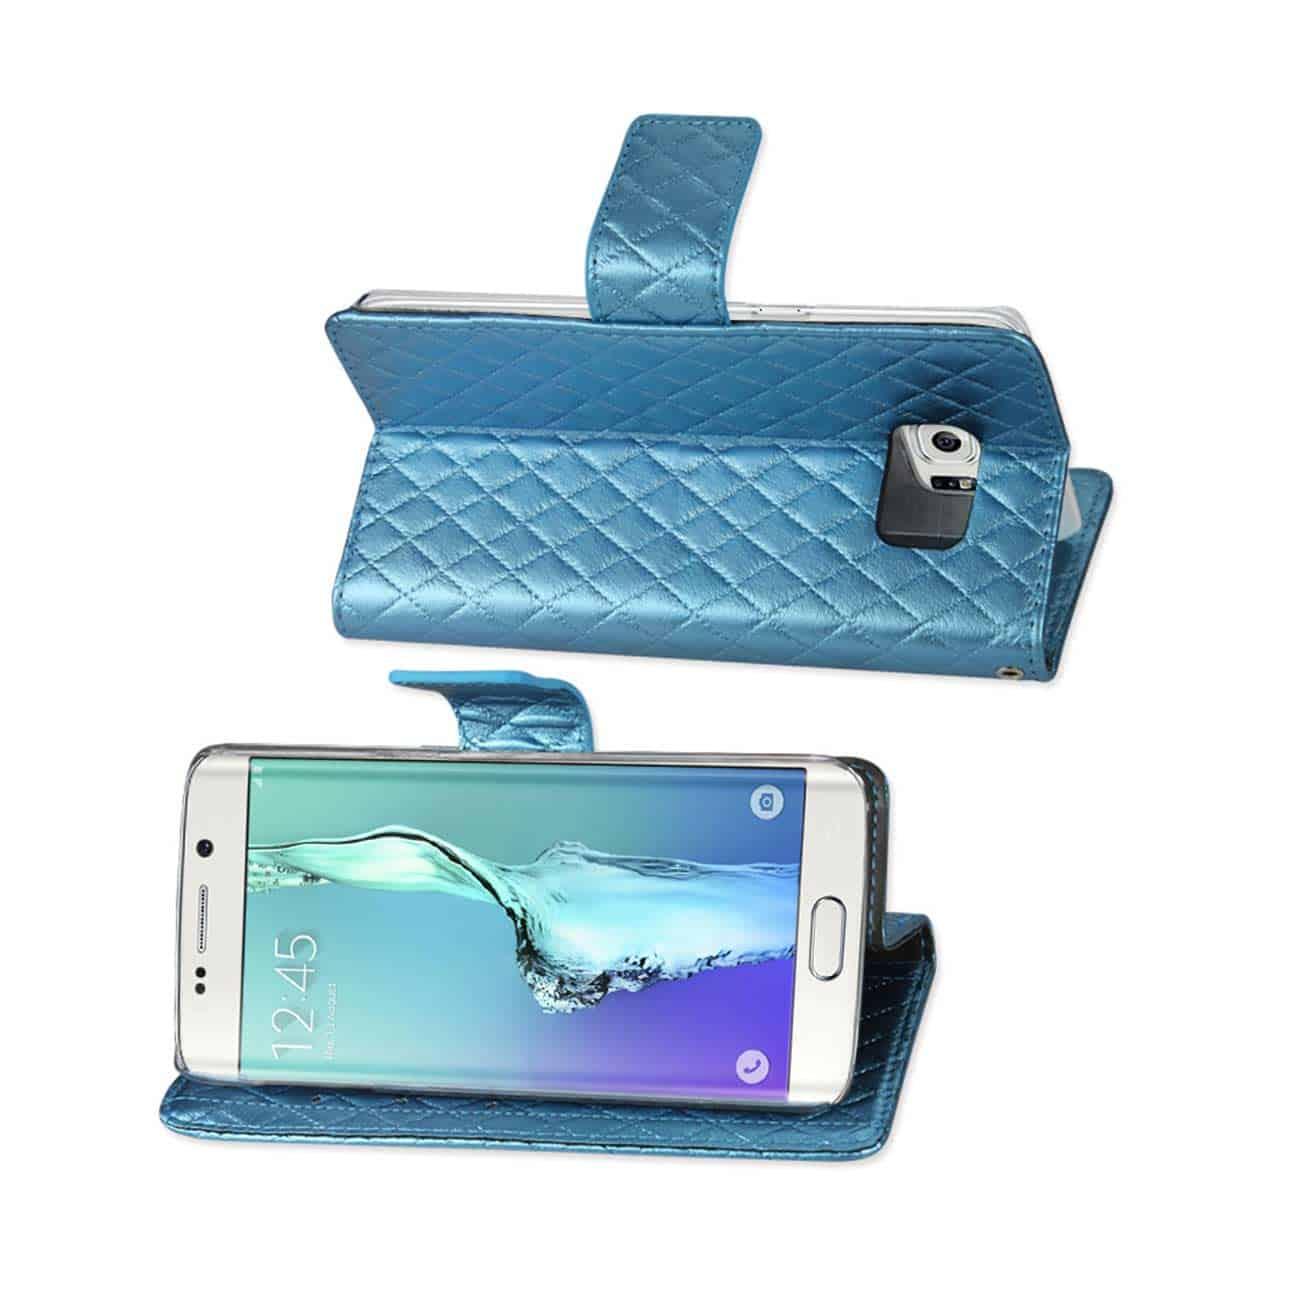 SAMSUNG GALAXY S6 EDGE PLUS RHOMBUS WALLET CASE IN BLUE